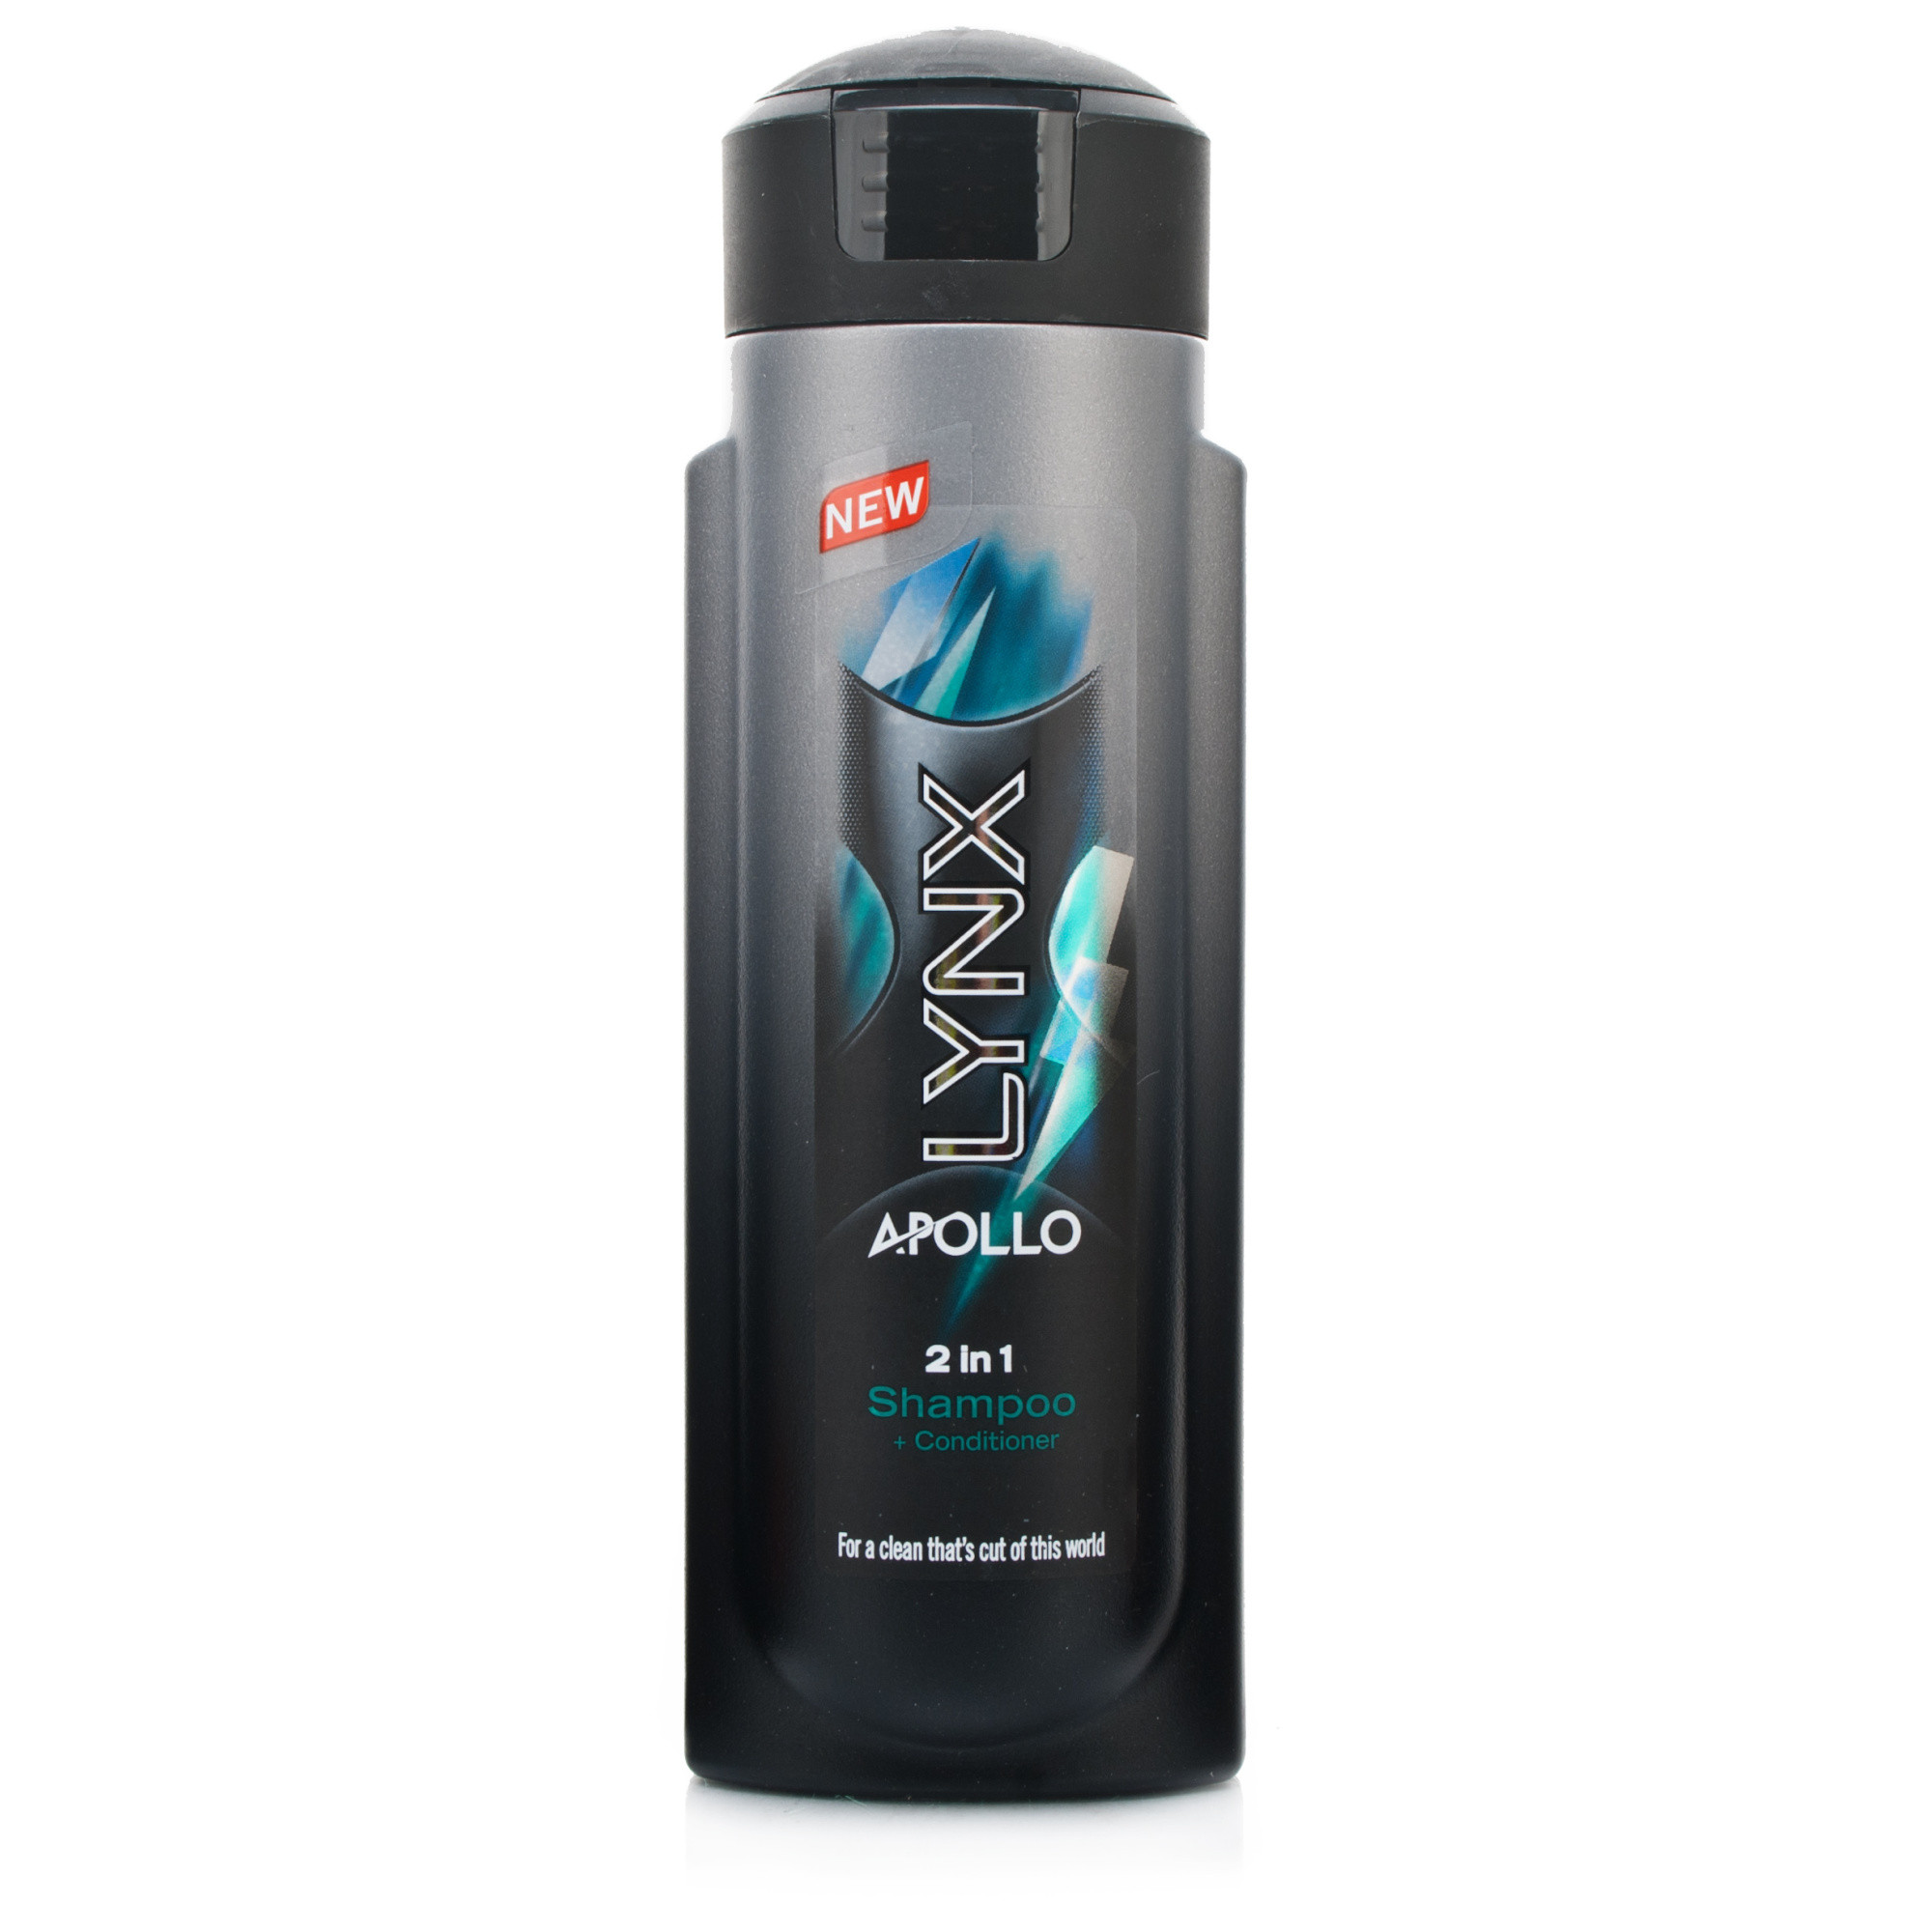 Allergy Eye Drops >> Lynx Apollo 2 in 1 Shampoo & Conditioner | Chemist Direct